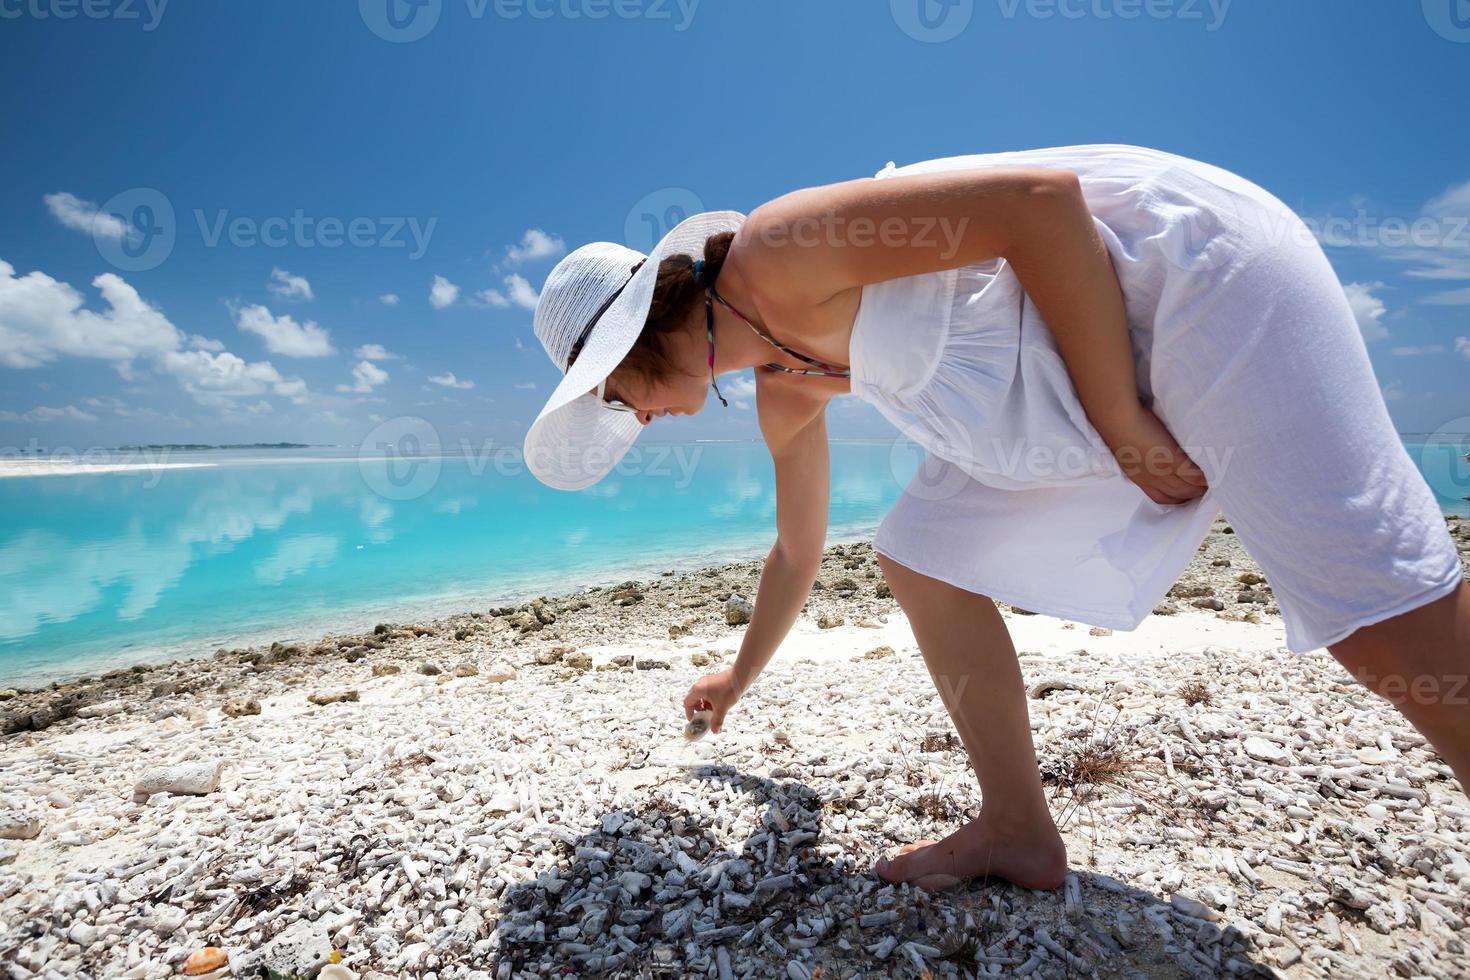 Caucasian woman collecting seashells at the beach photo